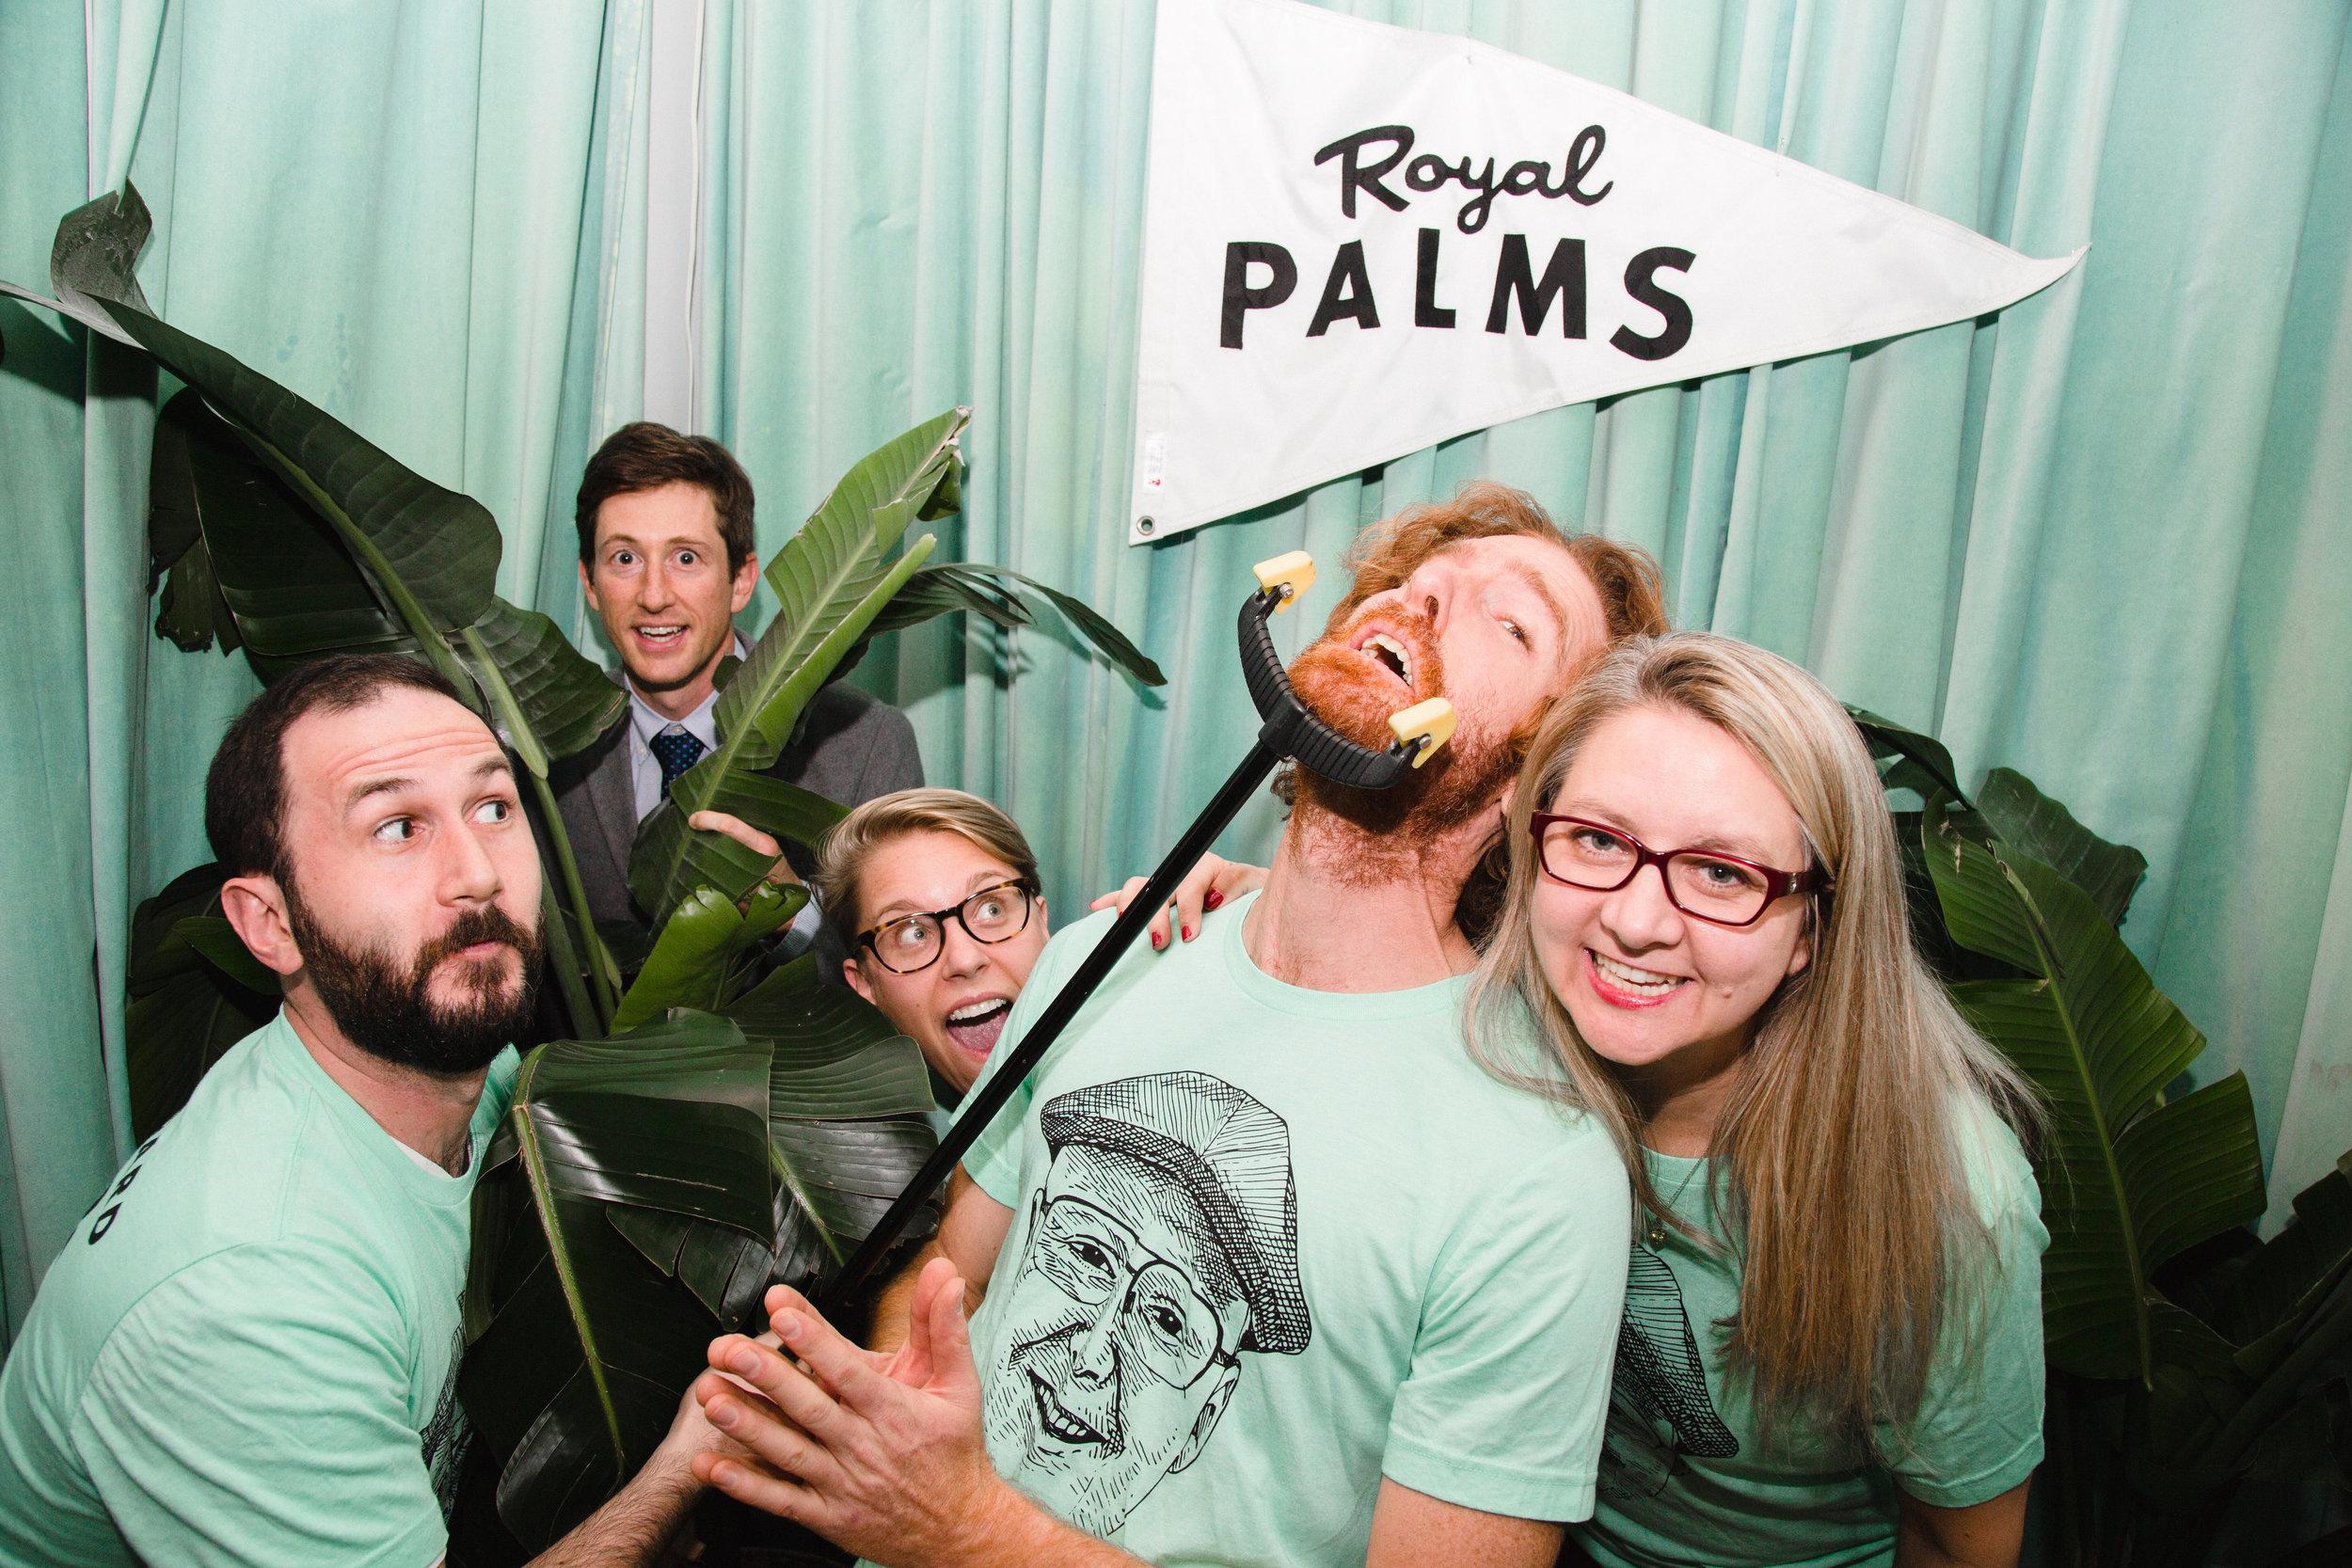 royalpalms-3508.jpg